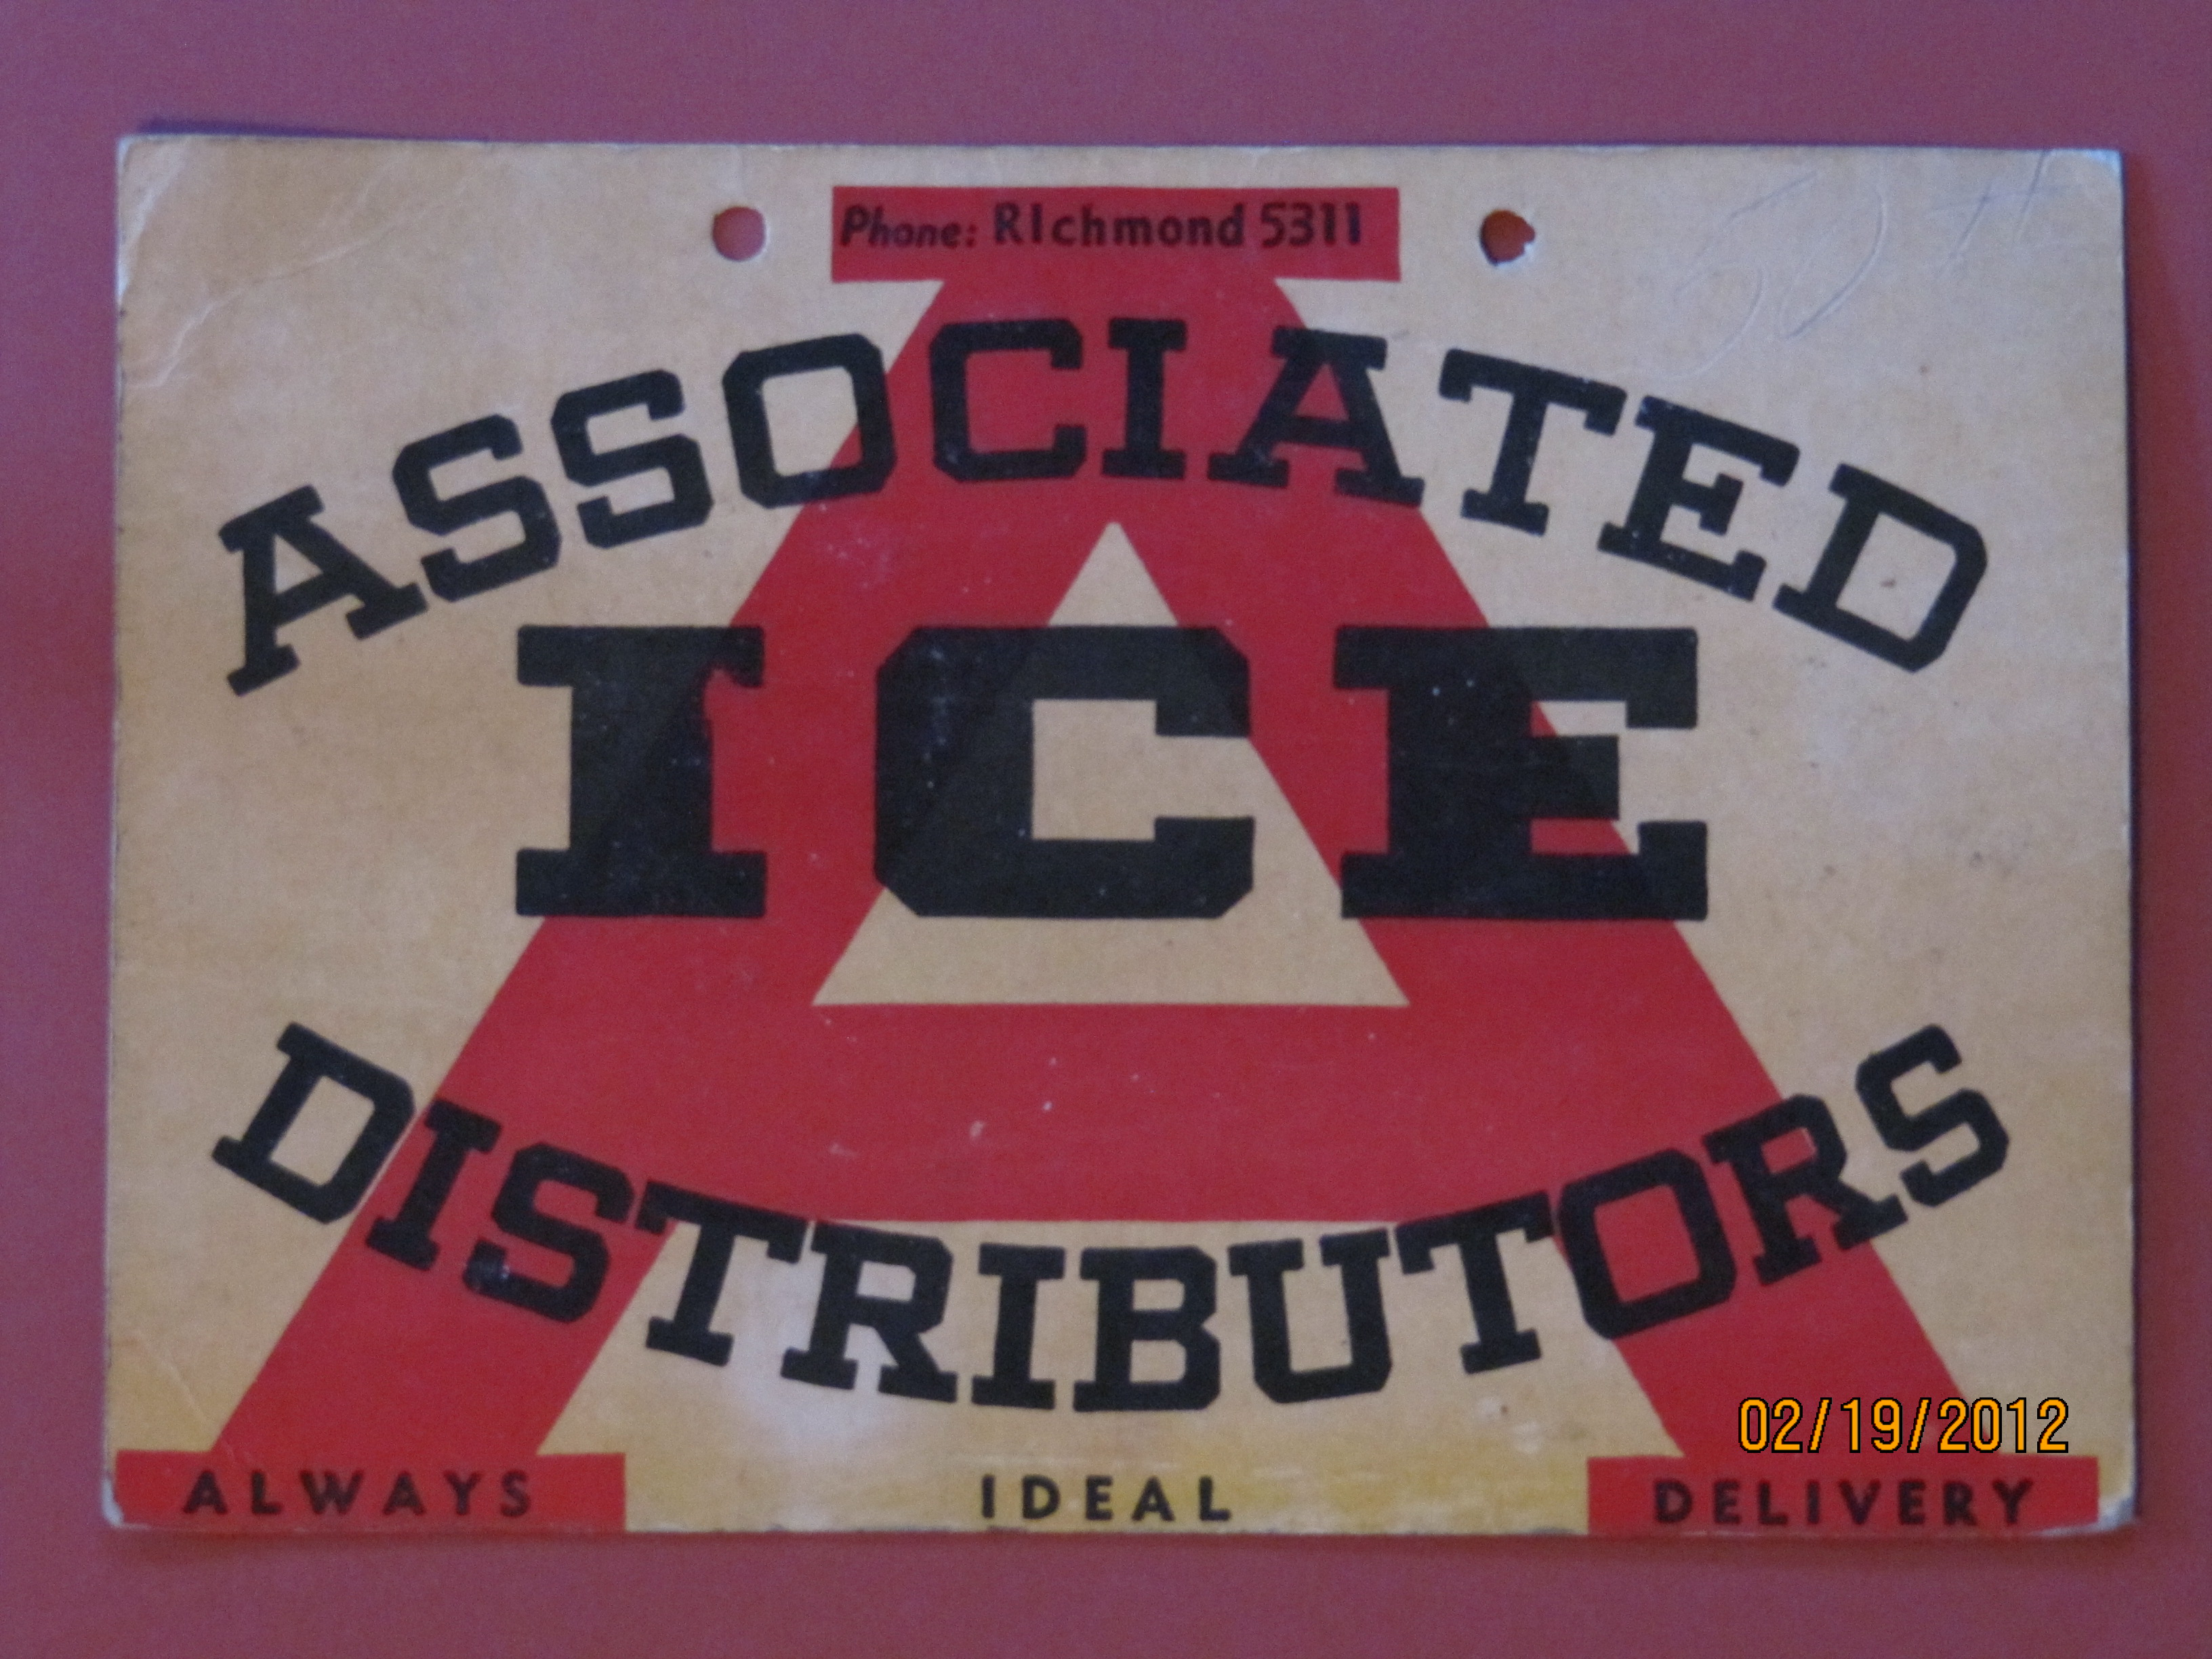 Associated Ice Distributors